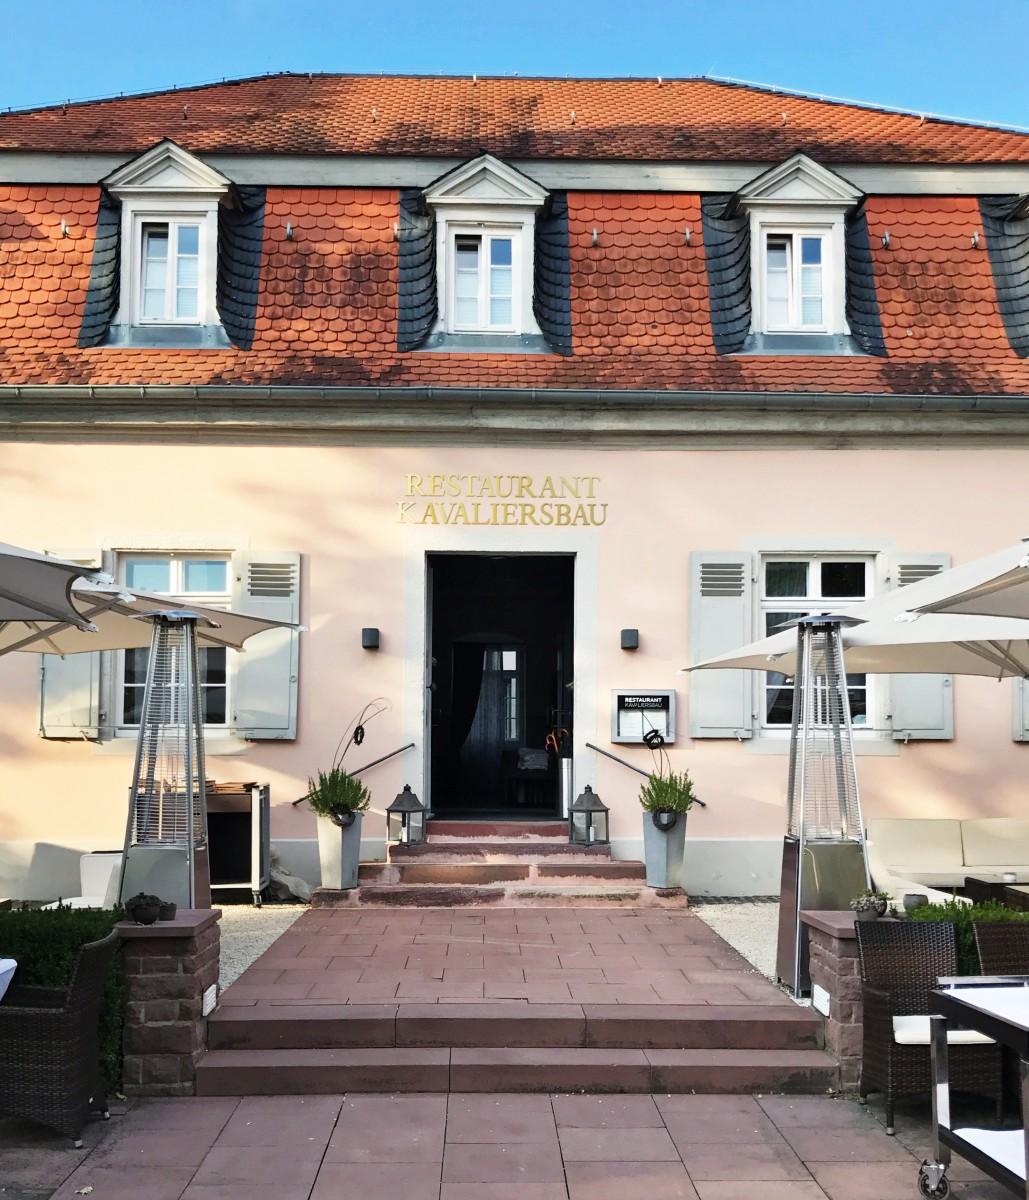 Hotel Jagdschloss Kranichstein Darmstadt, Germany Her Heartland Soul